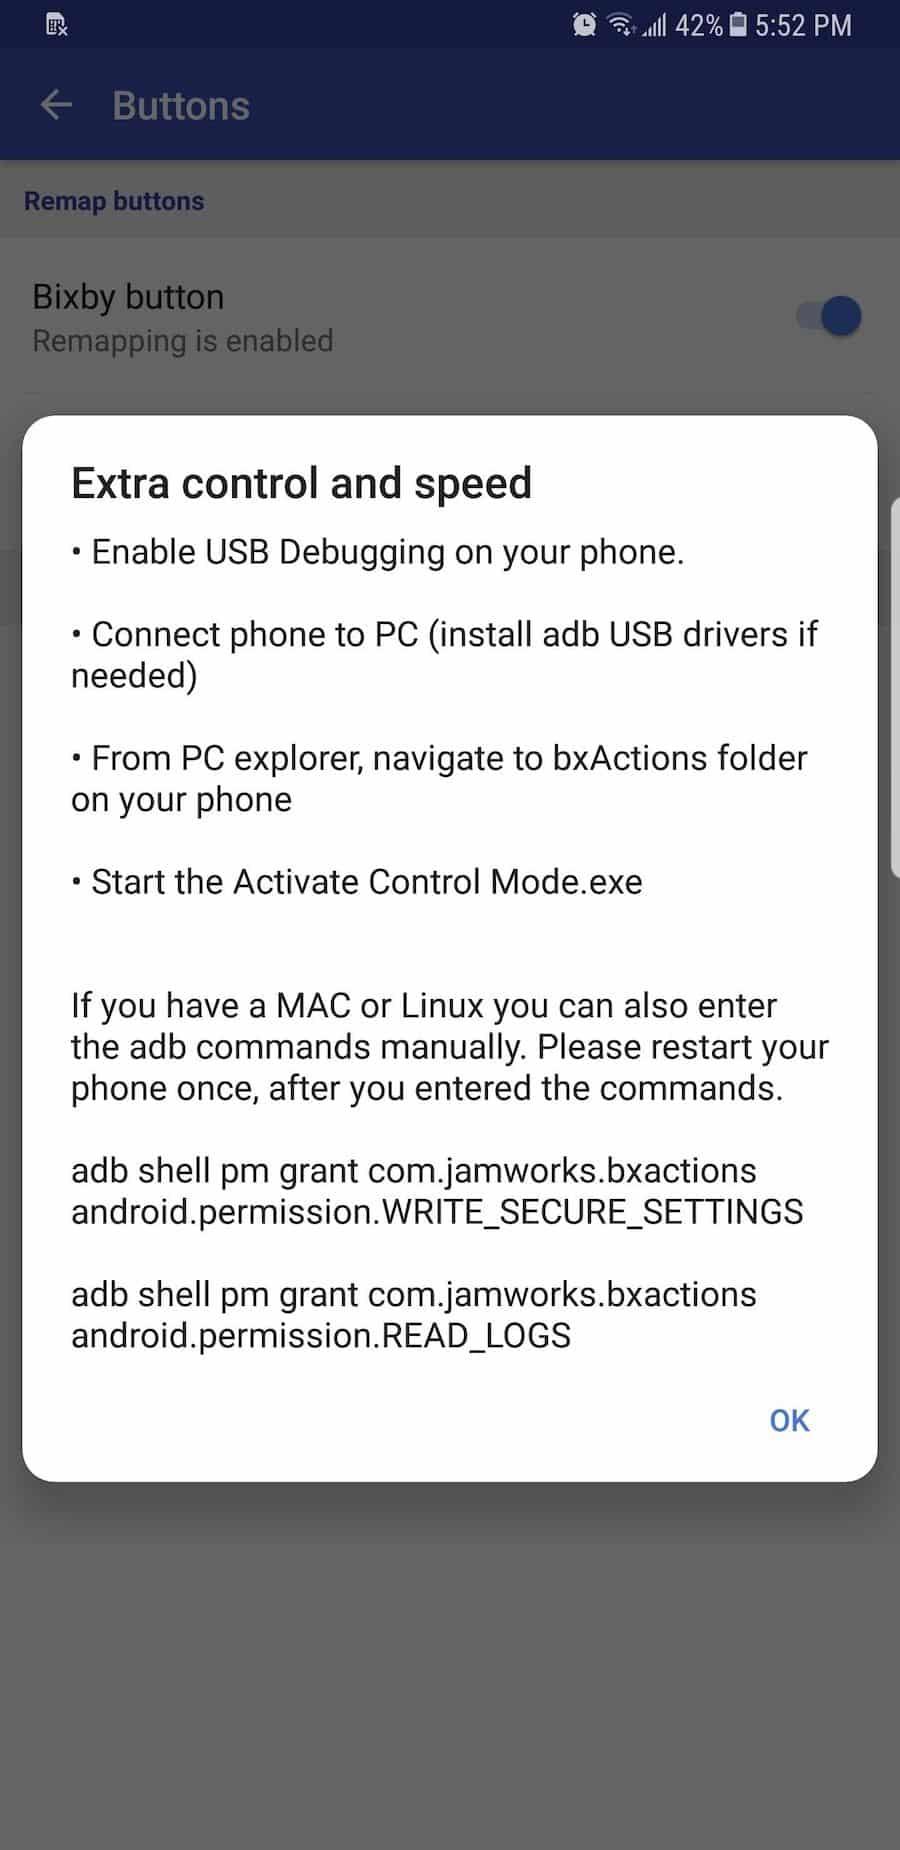 Altro metodo per sostituire Samsung Bixby con Google Assistant [Guida]